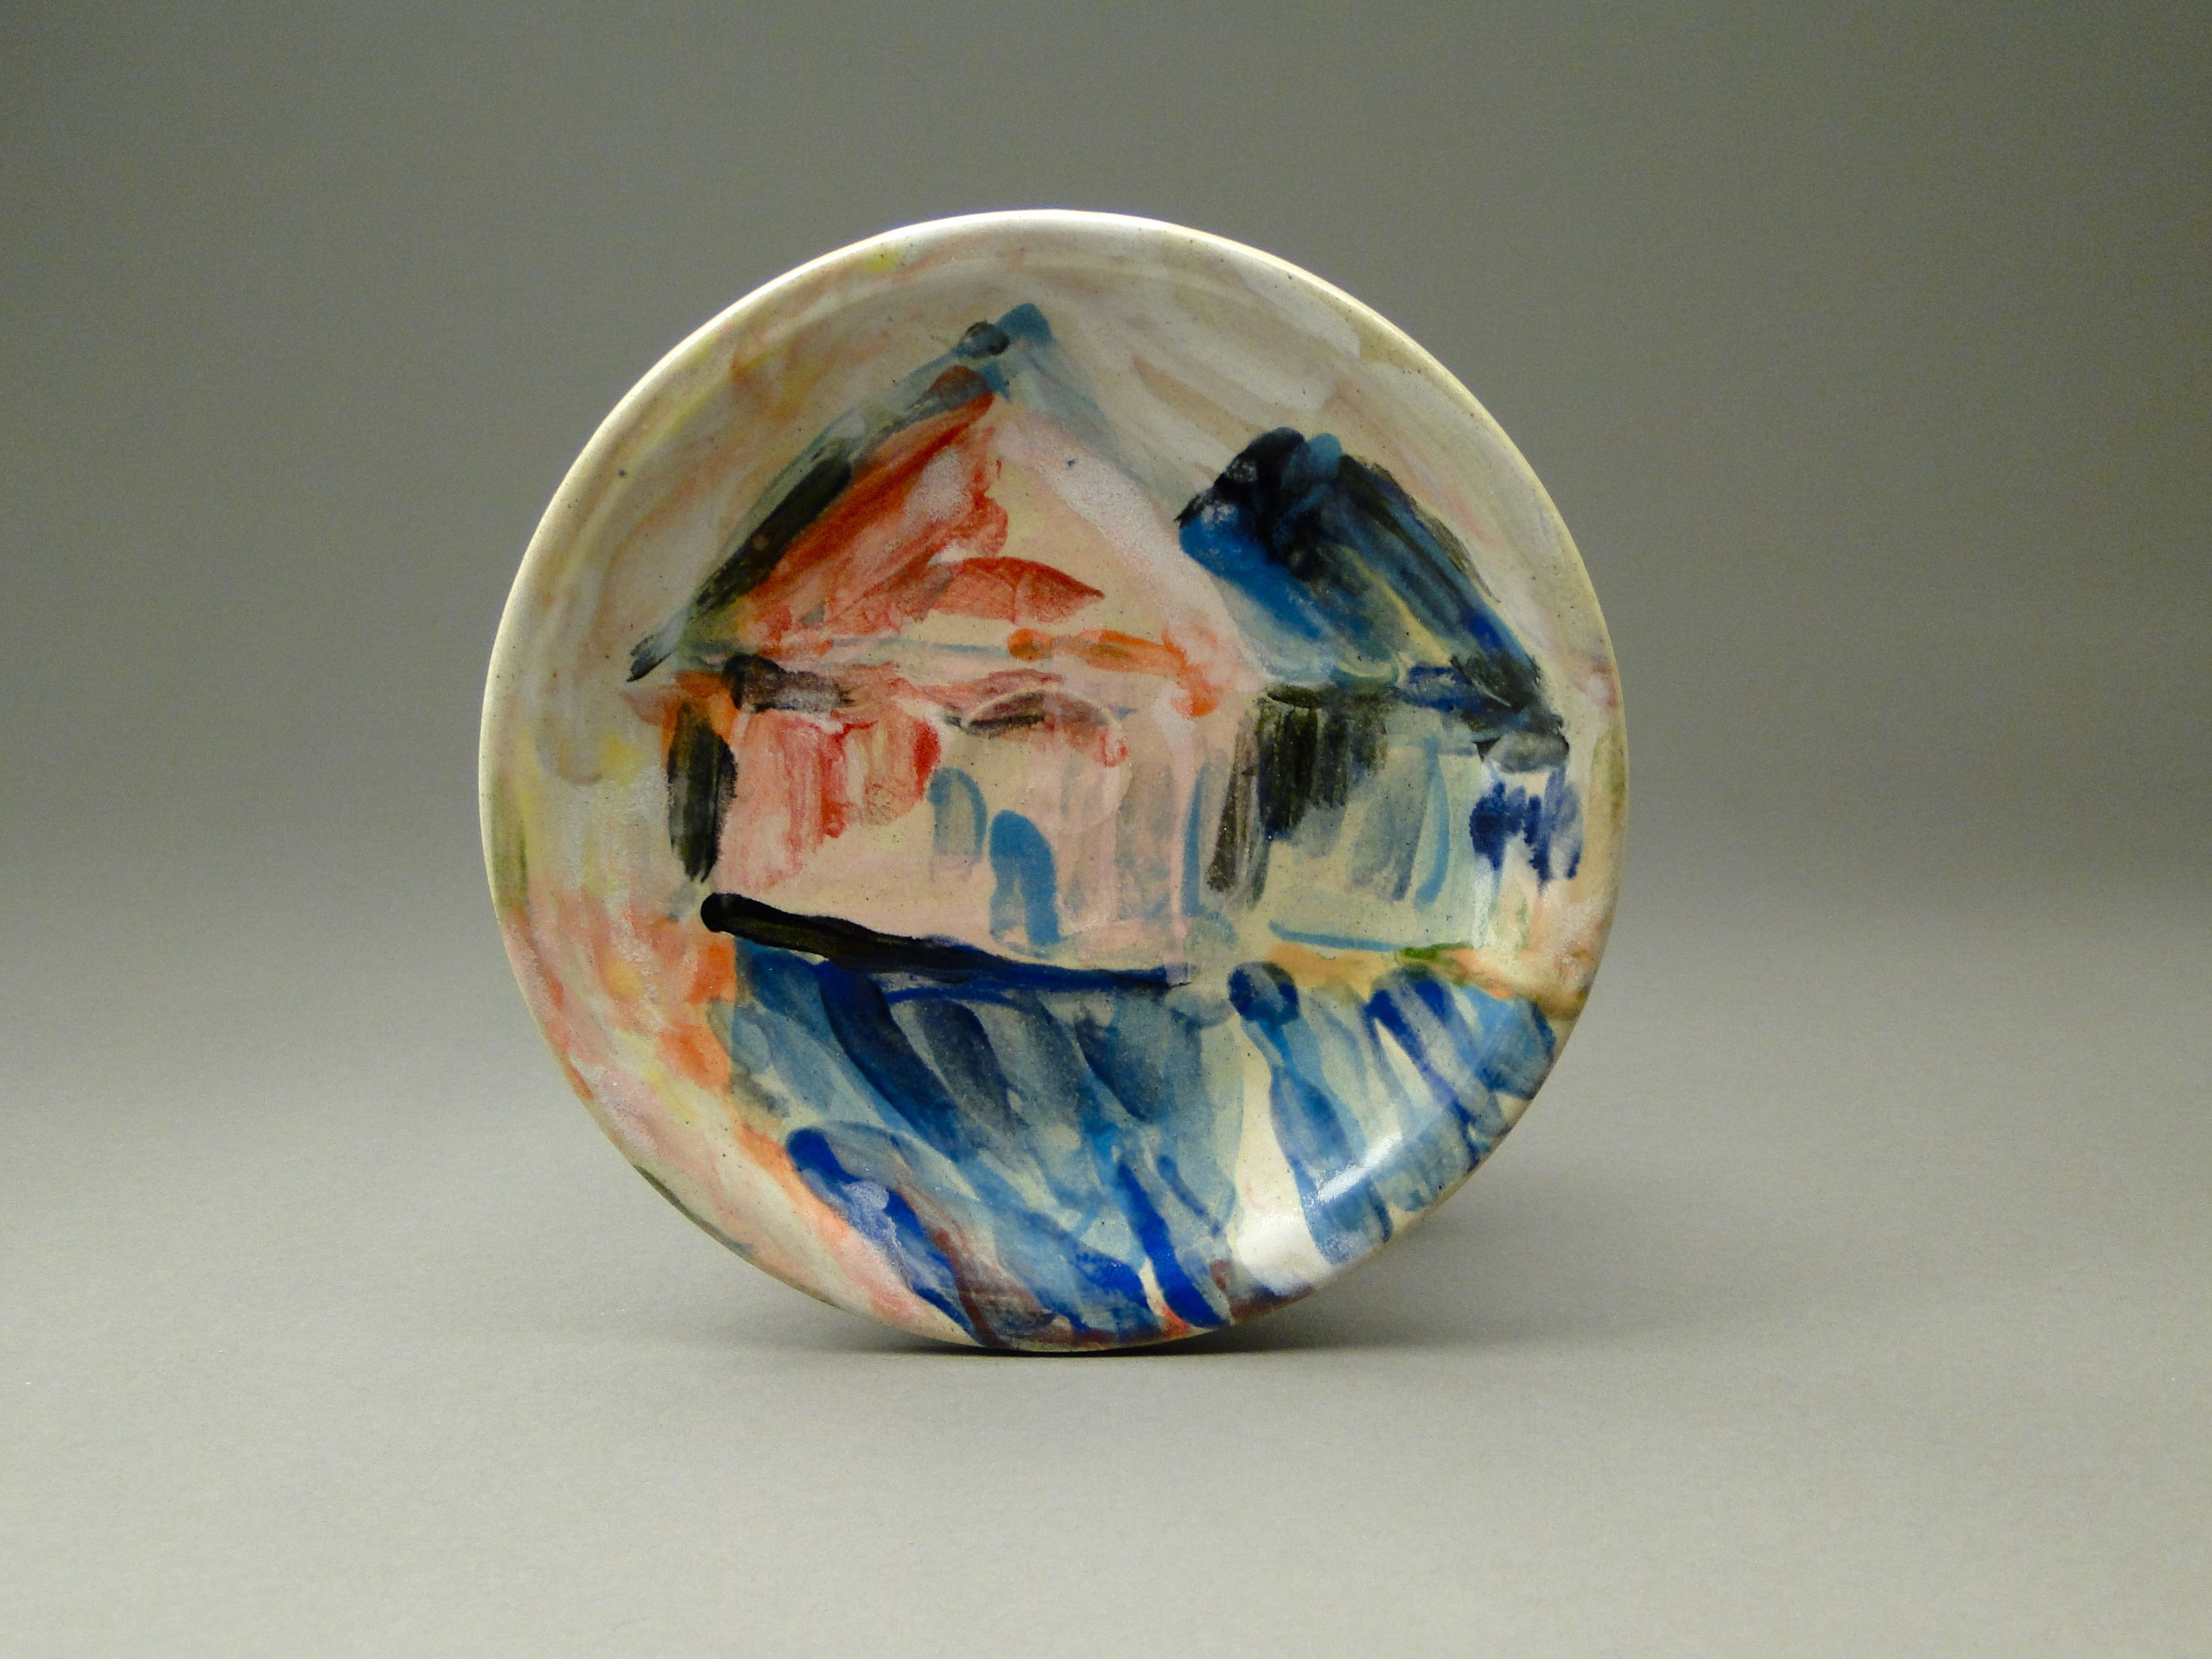 Painted Stoneware, Paige Dansinger, Artist Collaboration